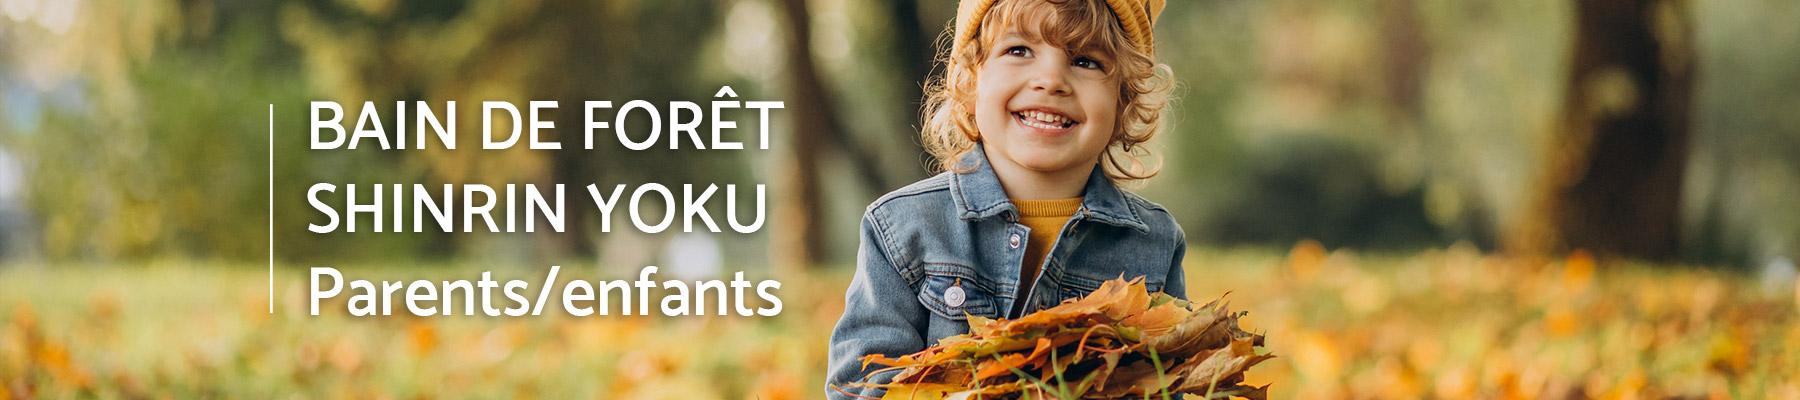 bain-foret-shinrin-yoku-sylvotherapie-caen-calvados-guide-certifie-parents-enfants-en-famille